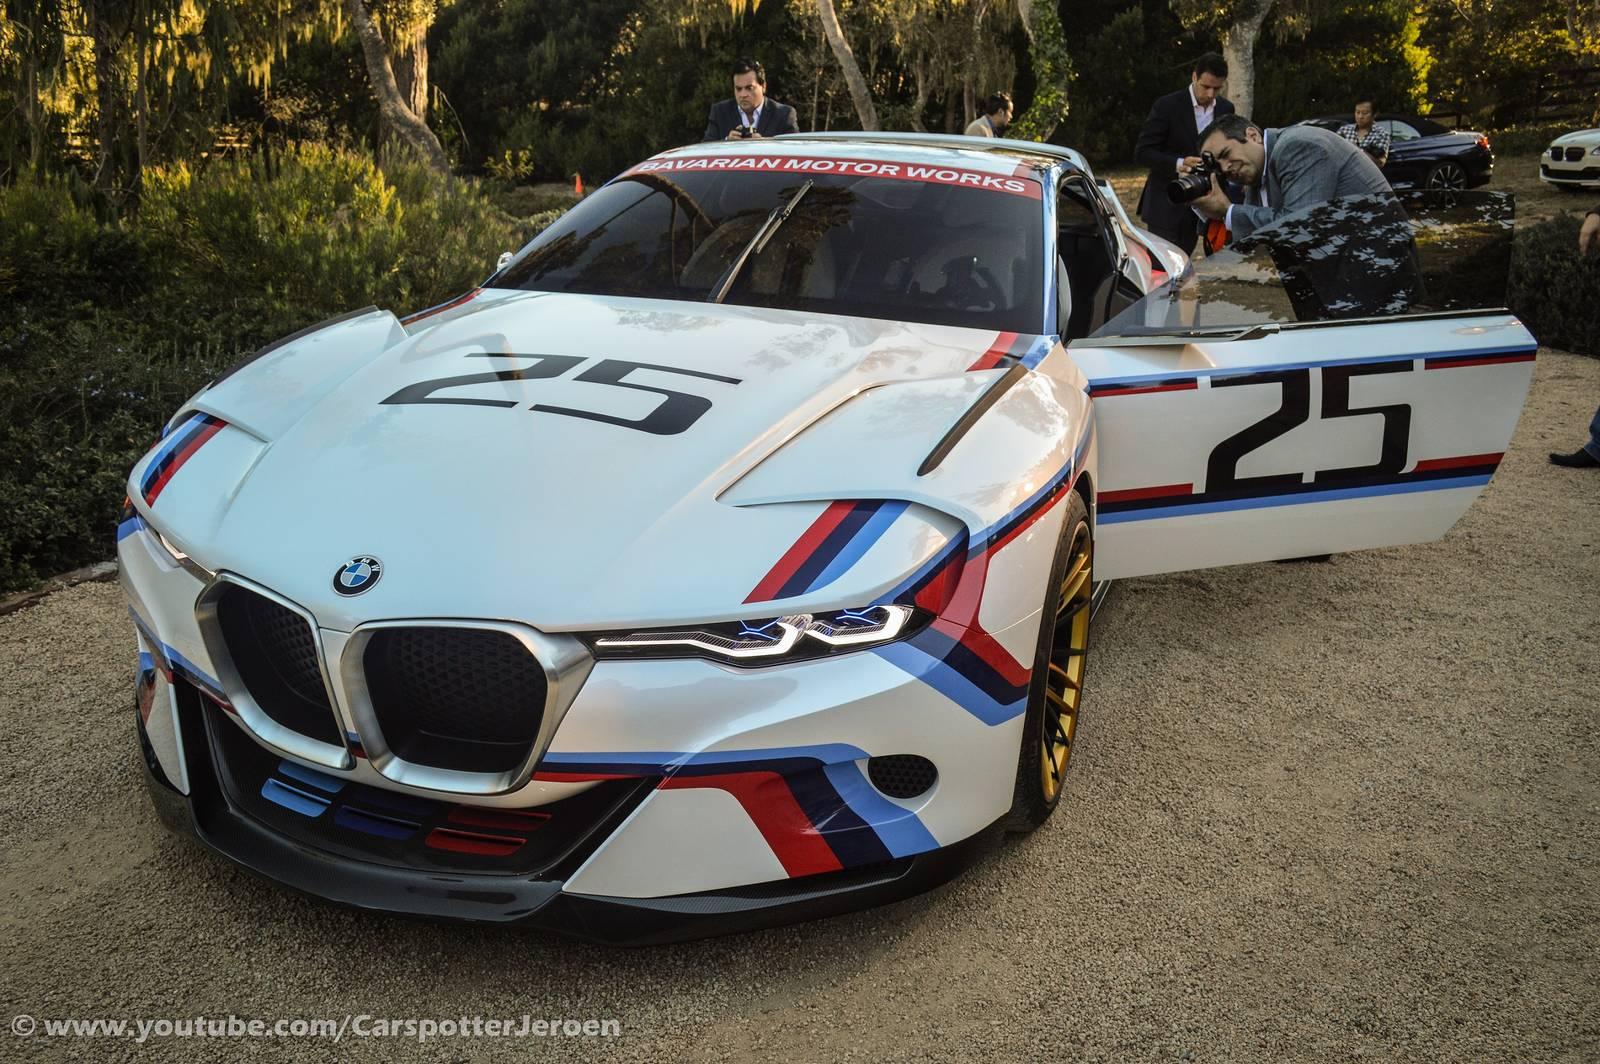 BMW Convertible 2015 bmw m4 white Monterey 2015: BMW Concept M4 GTS and 3.0 CSL Hommage R - GTspirit